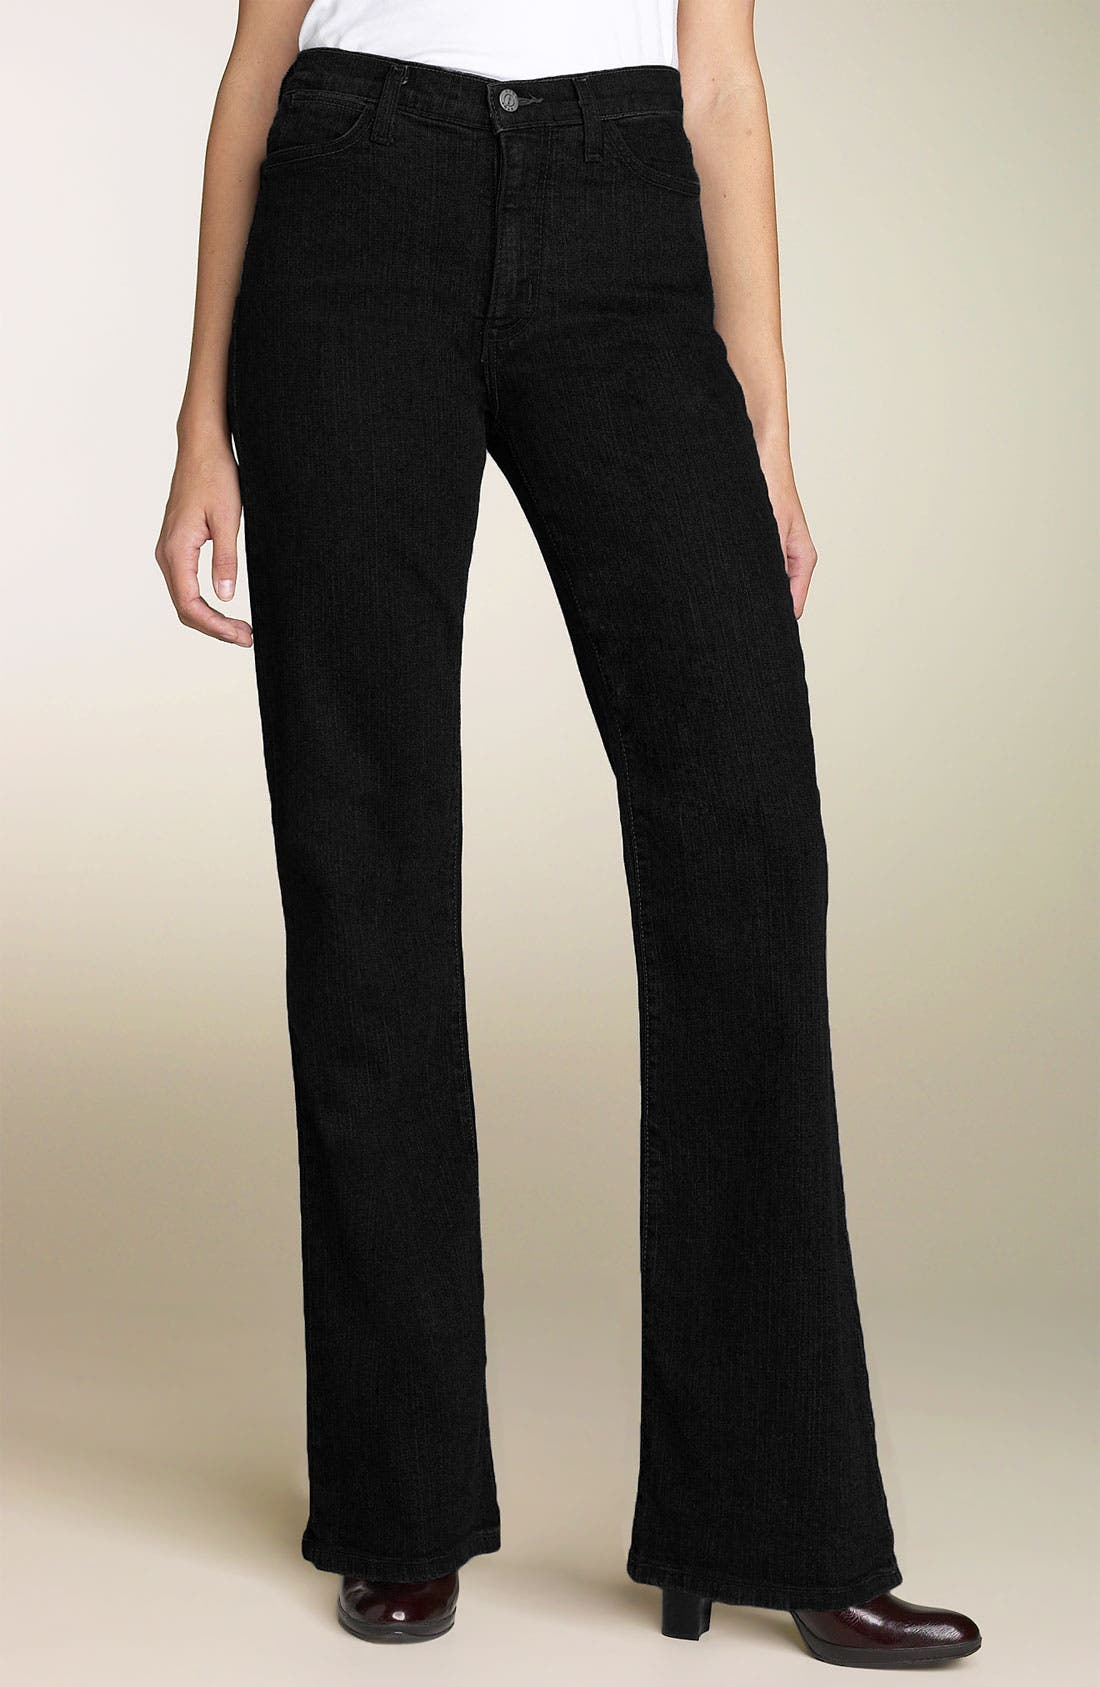 Alternate Image 1 Selected - NYDJ 'Sarah' Stretch Bootcut Jeans (Black) (Long)